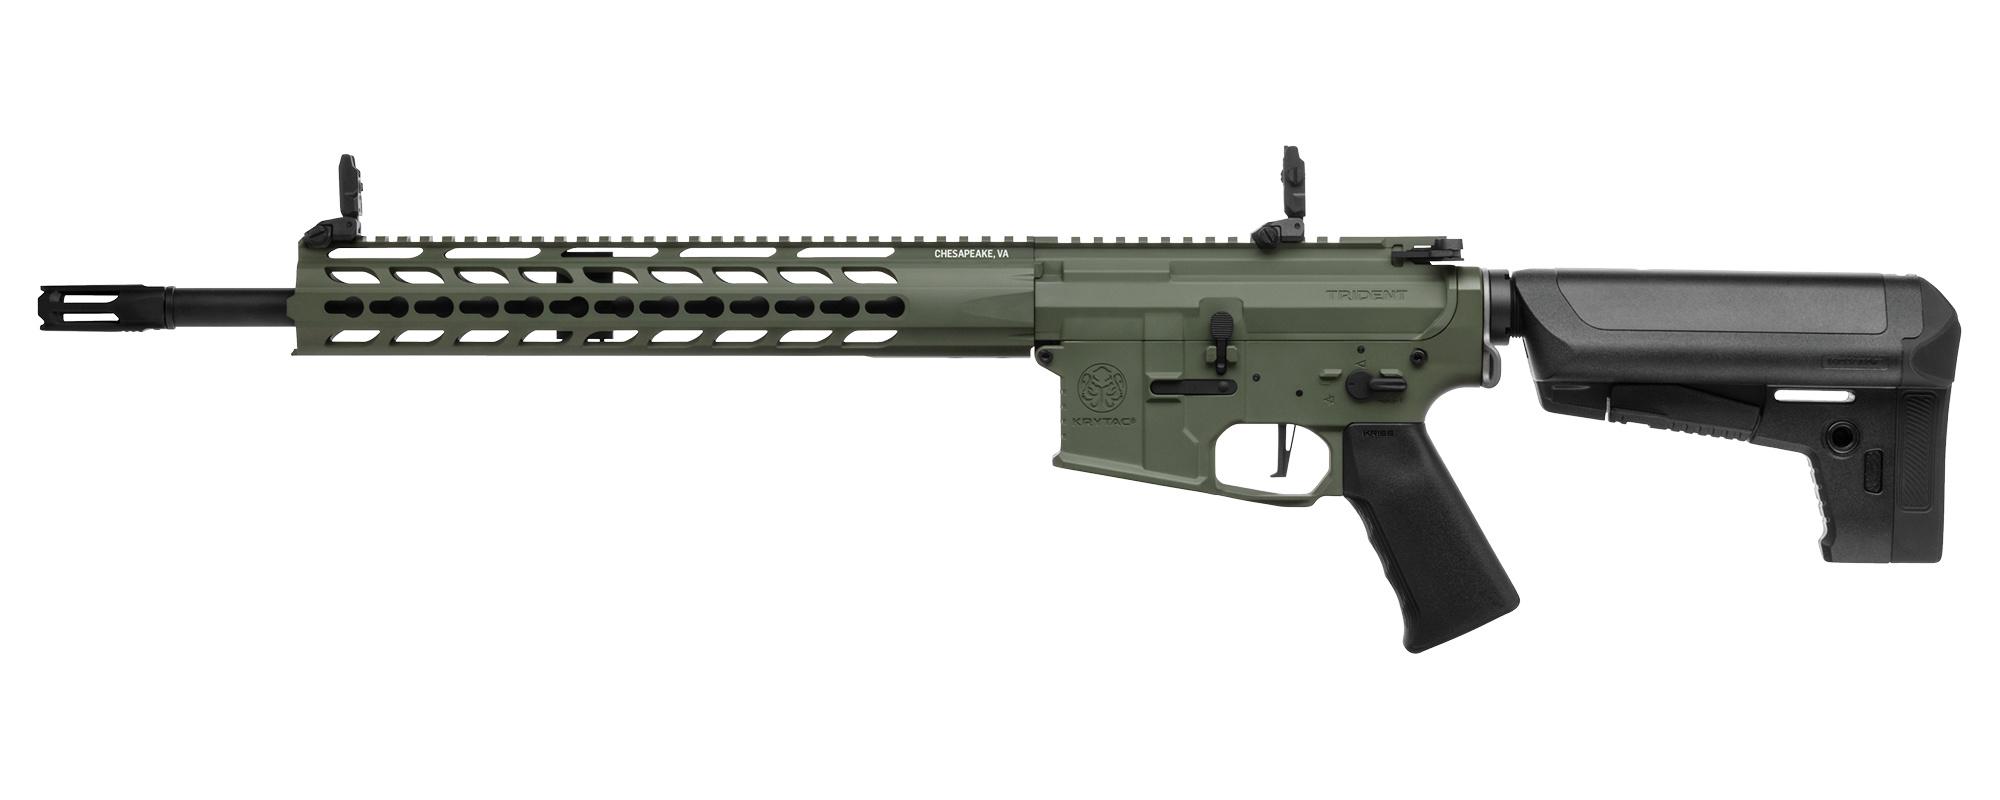 Krytac Full Metal Trident MK2 SPR - FG